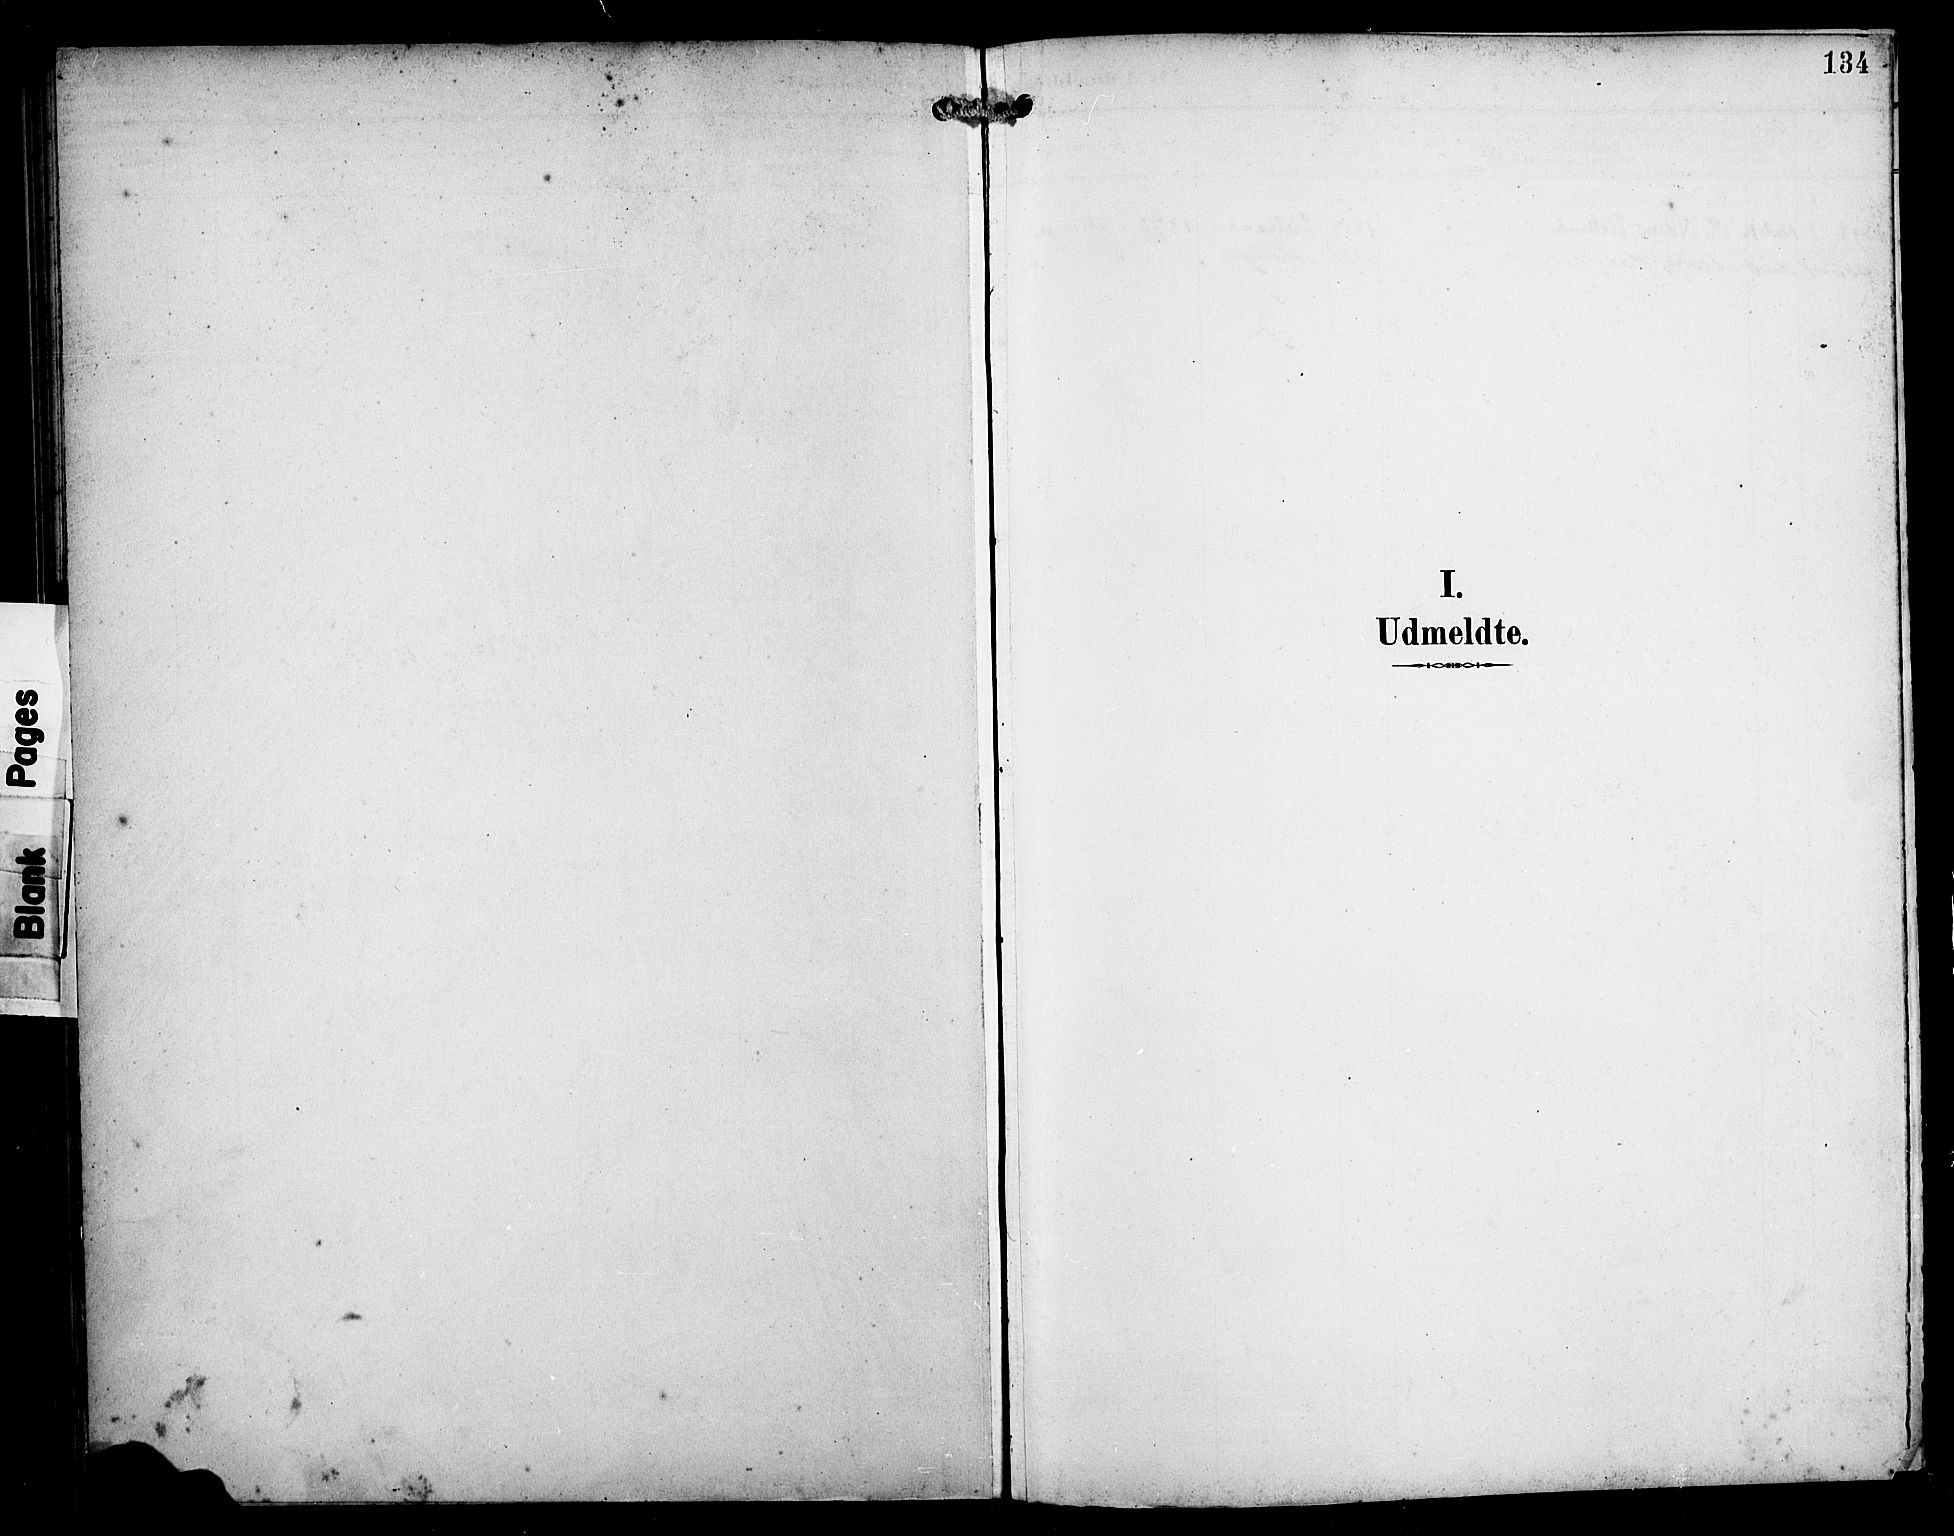 SAB, Manger sokneprestembete, H/Haa: Parish register (official) no. B 2, 1893-1906, p. 134